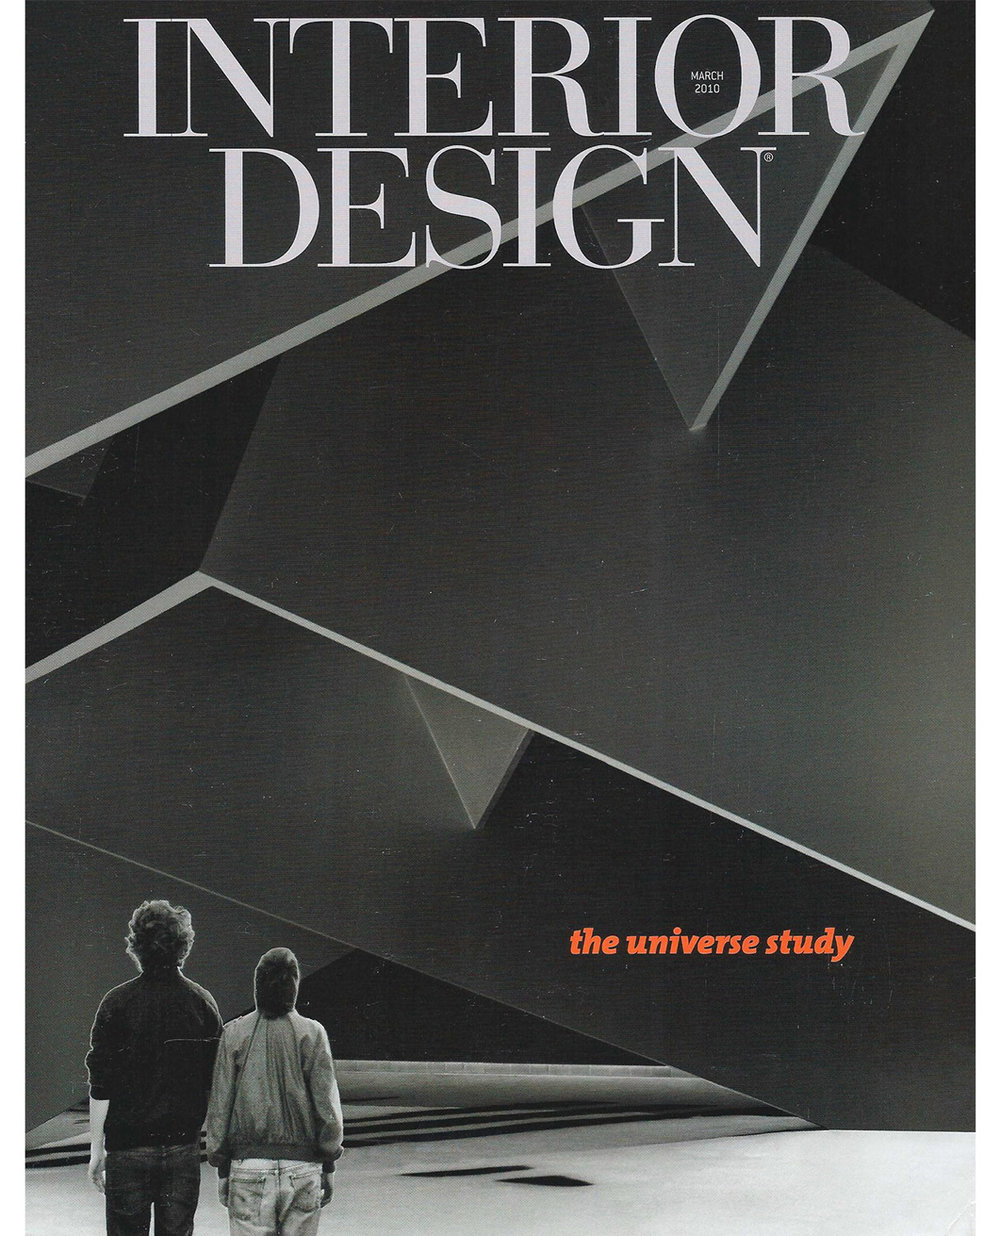 interiordesign2010_alemanmoore.jpg